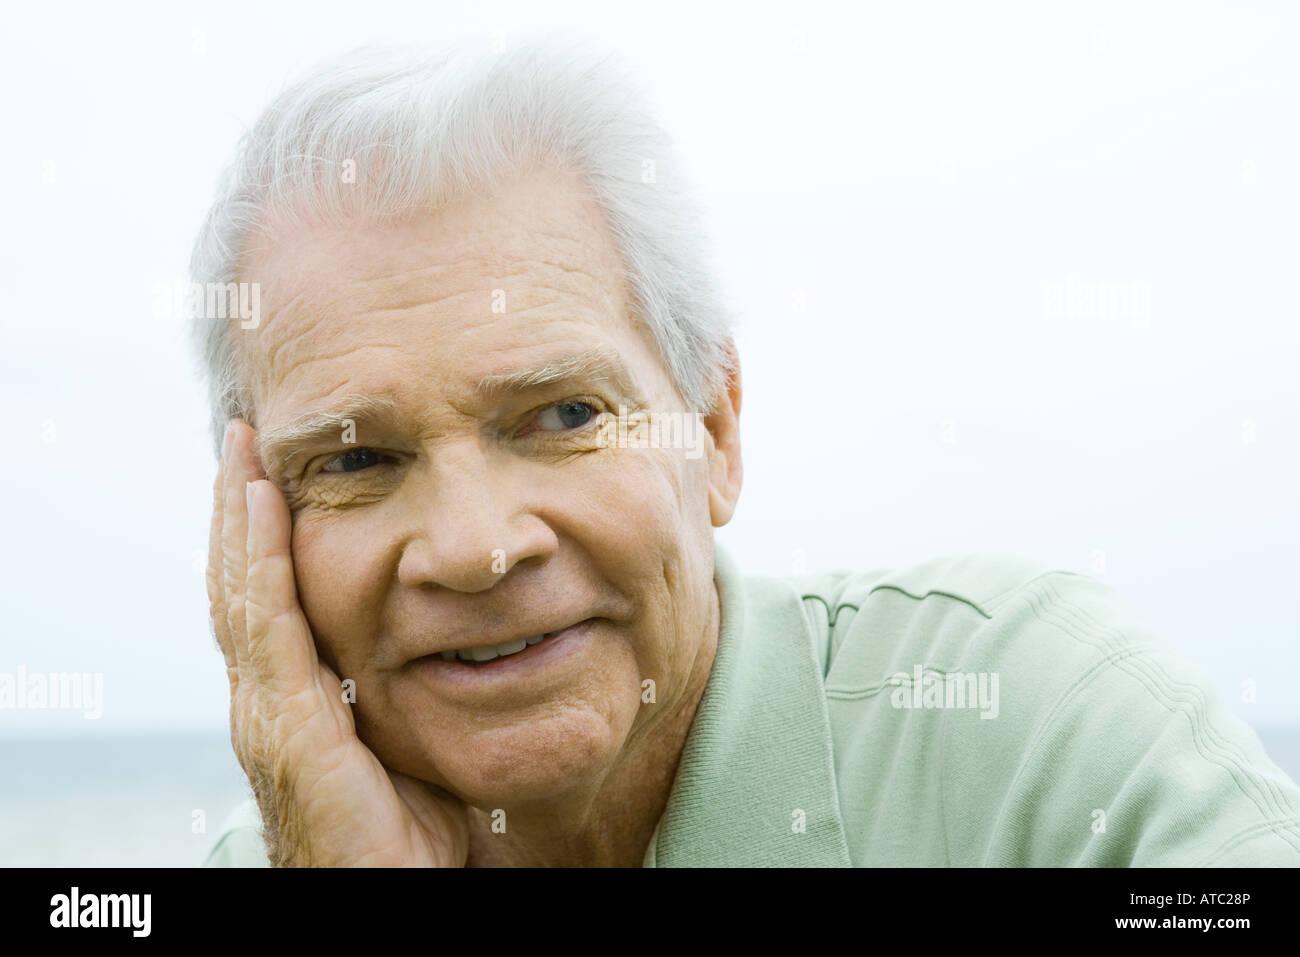 Ältere Mann mit Hand auf Wange, Lächeln, wegschauen Stockbild